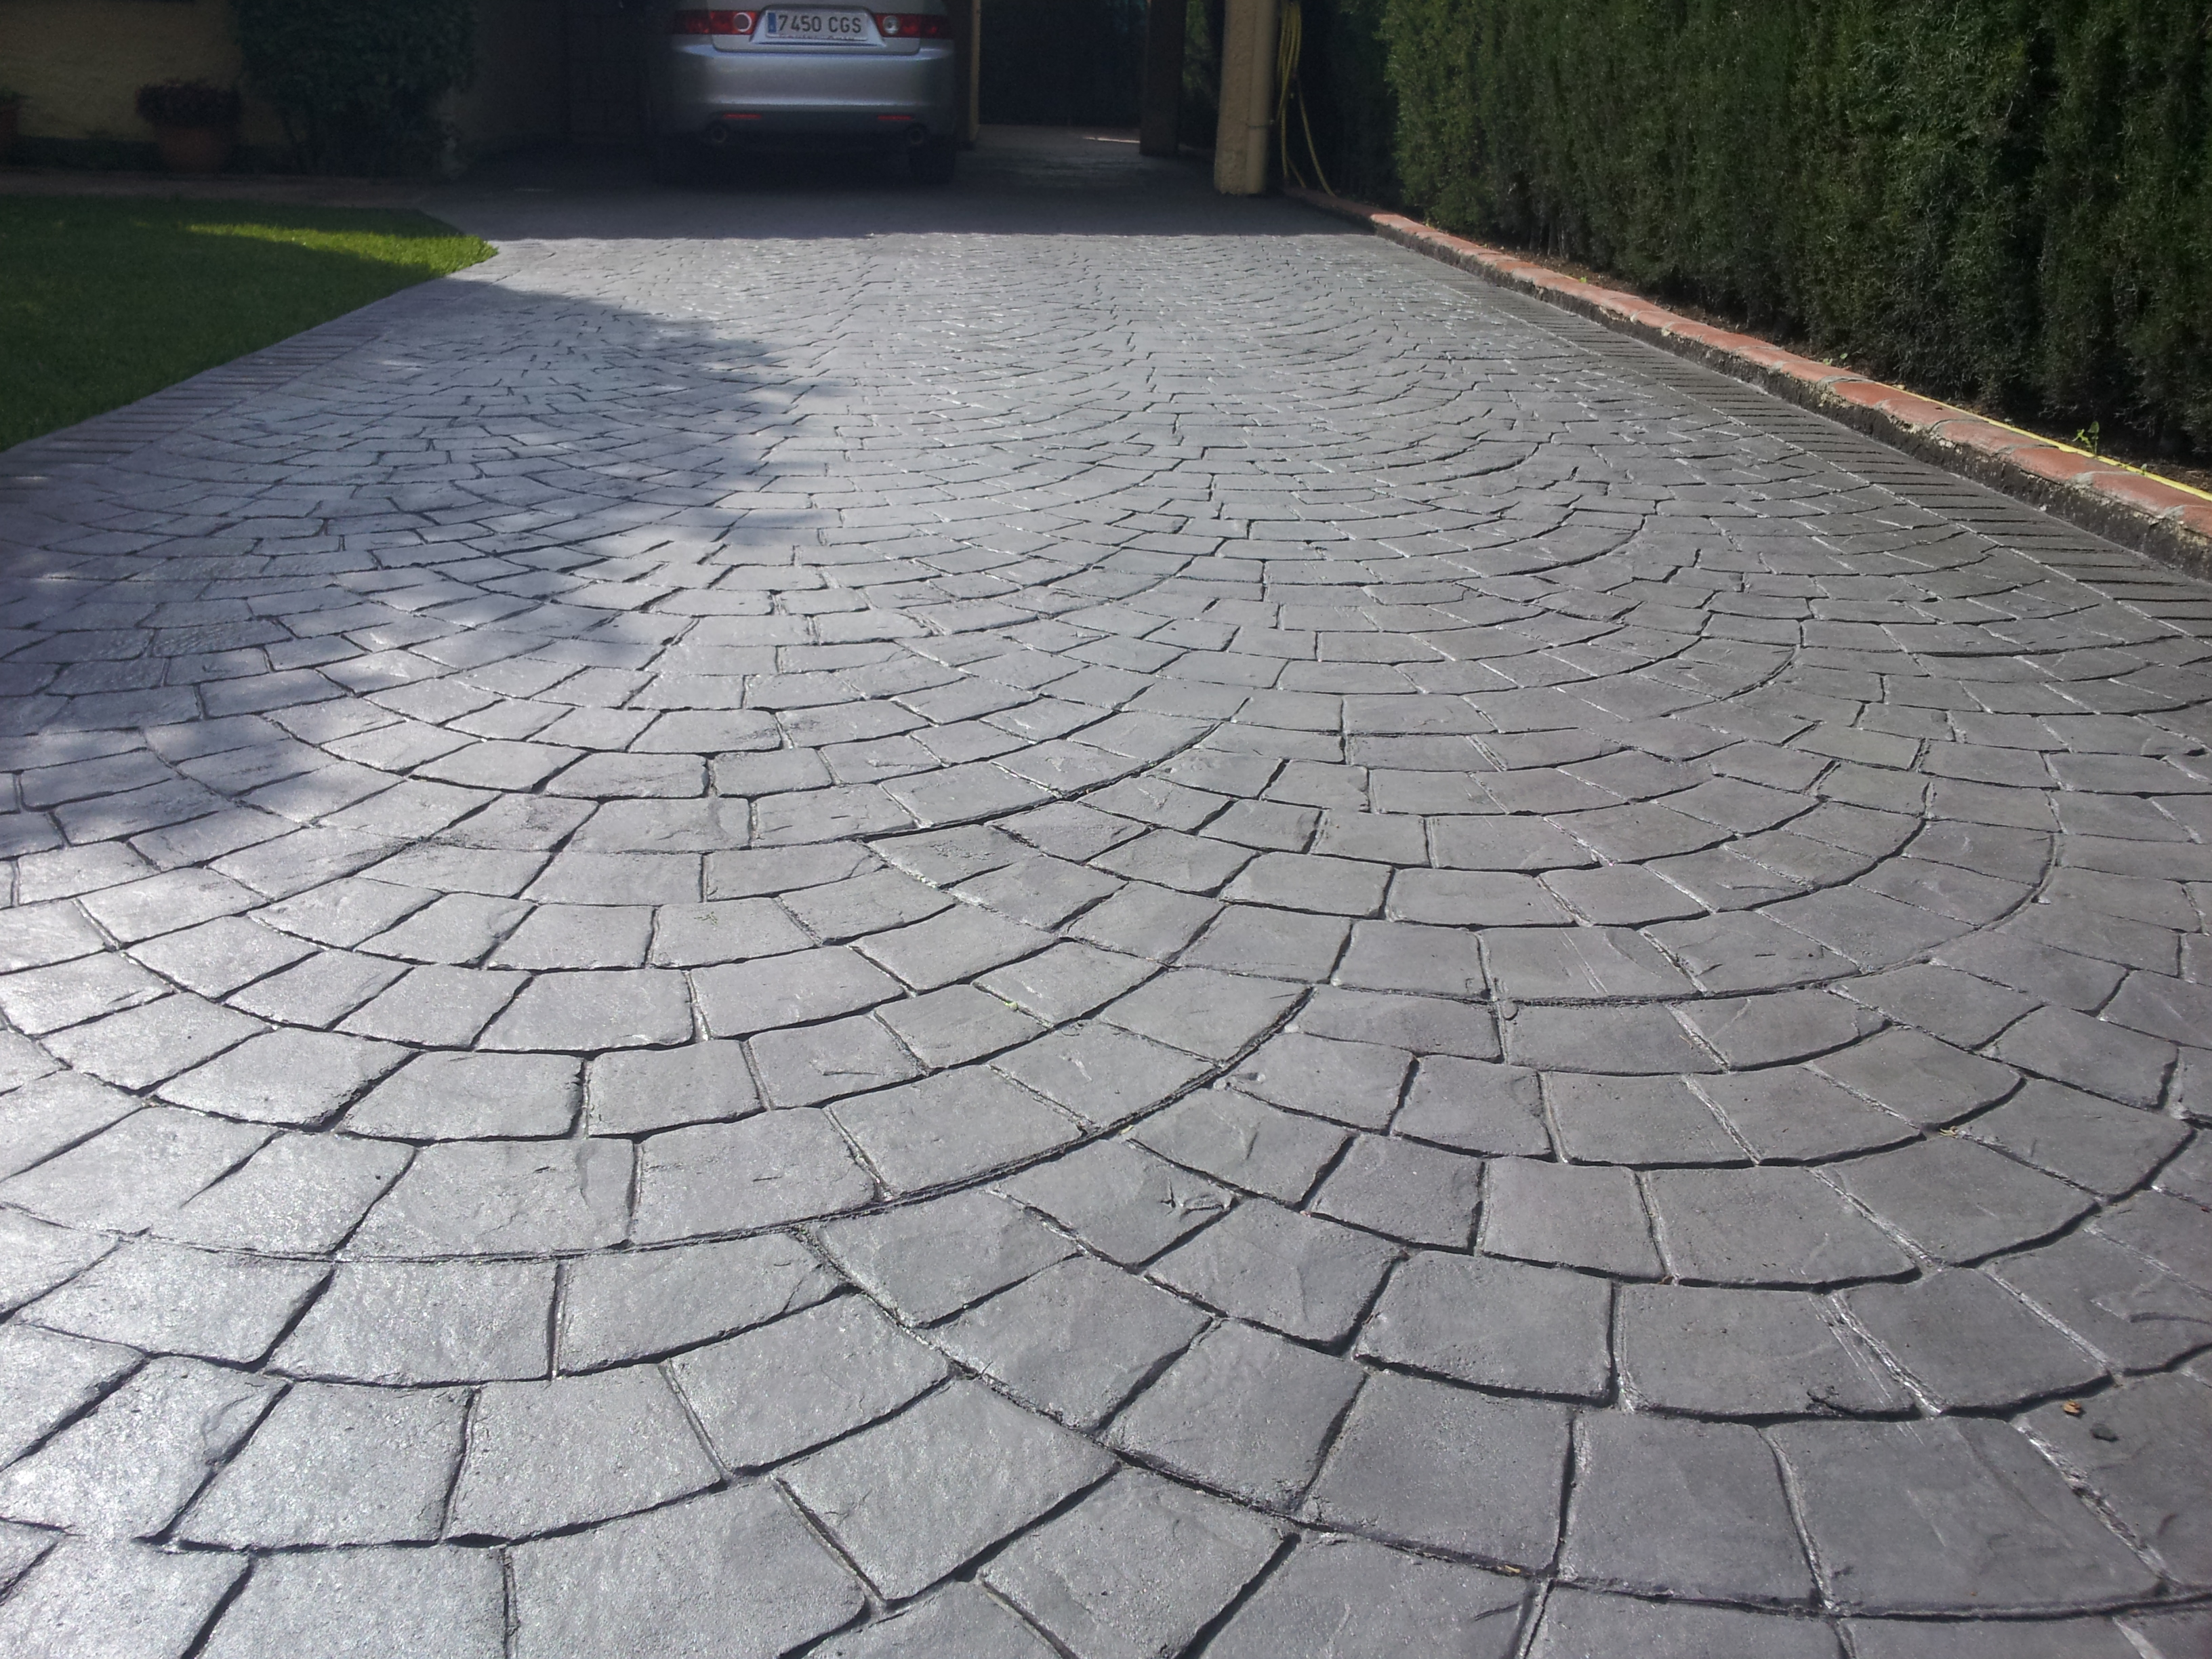 Hormigon impreso aspe hormigon impreso aspe cemento - Cemento pulido exterior ...